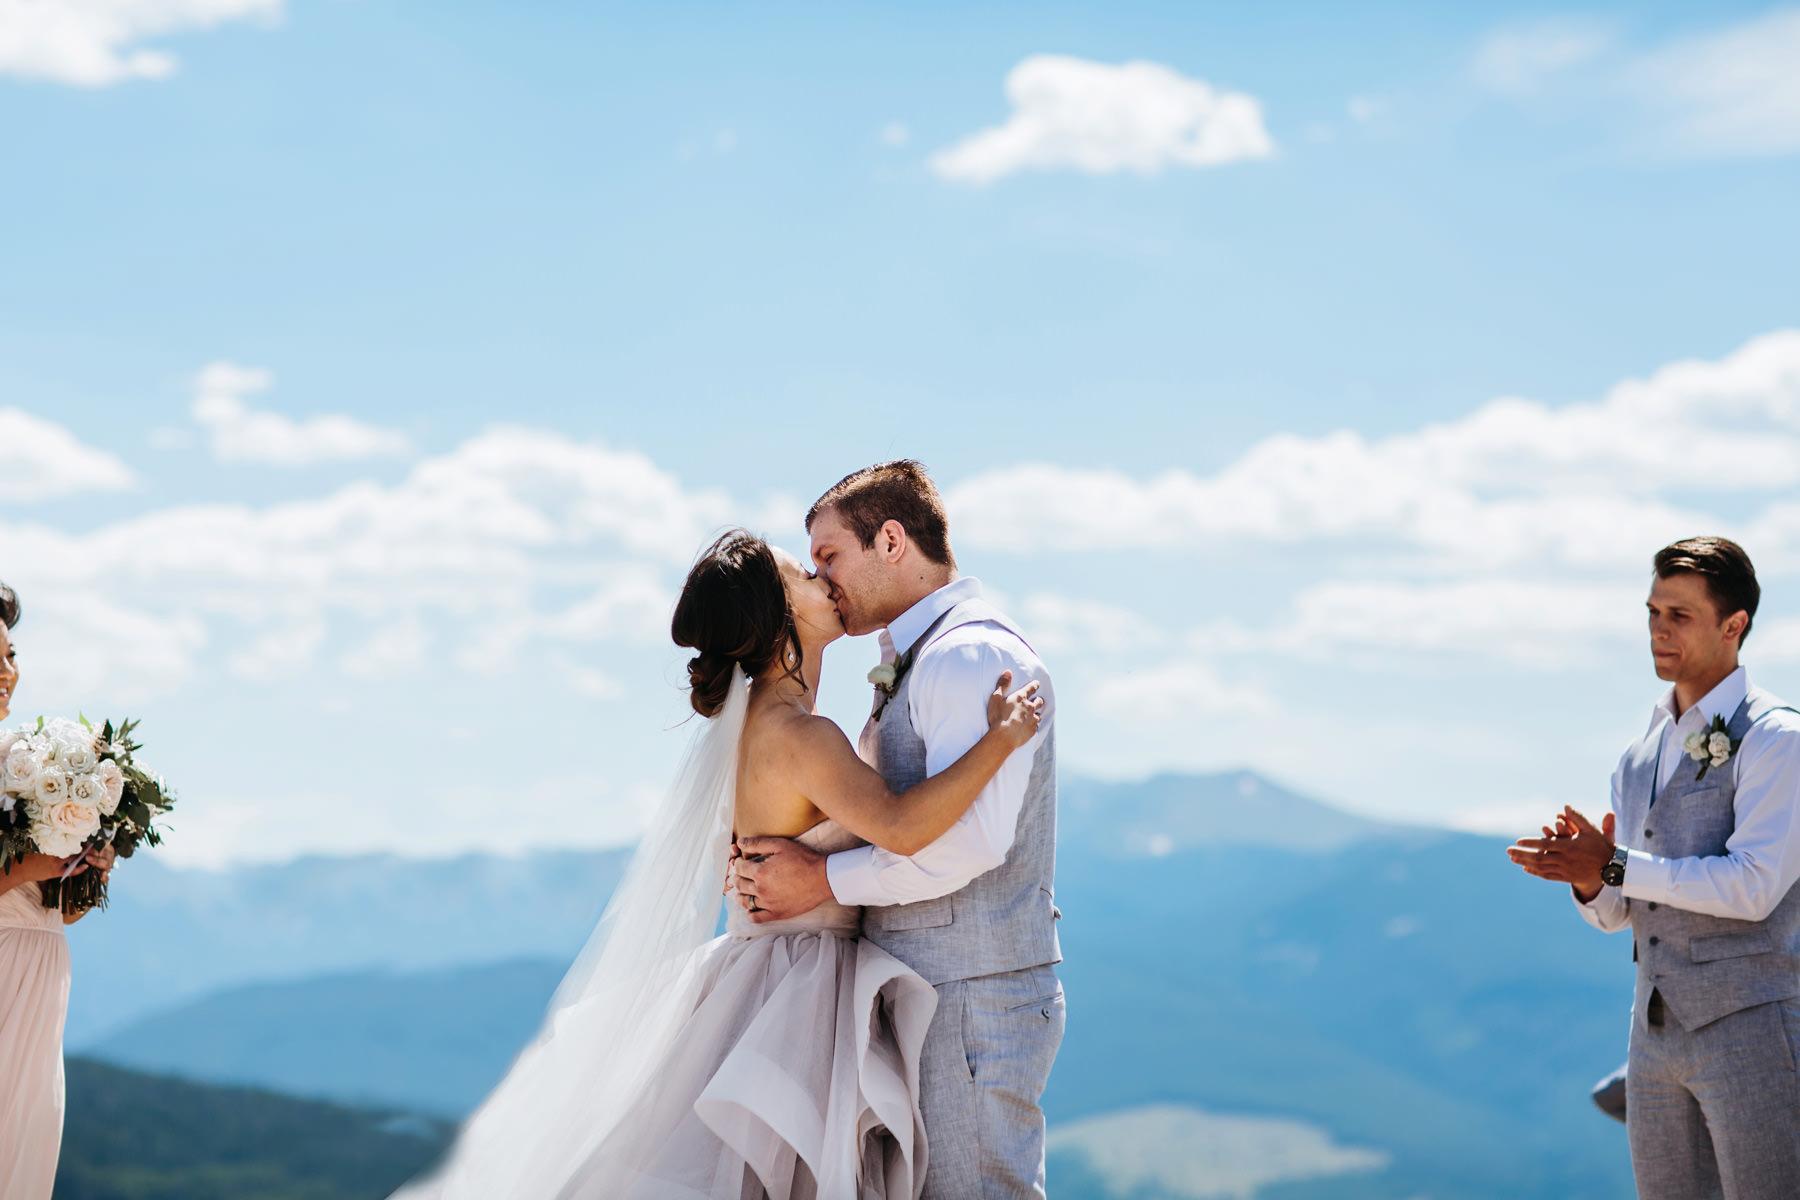 Vail Colorado Wedding Deck_ Kindling Wedding Photography37.JPG